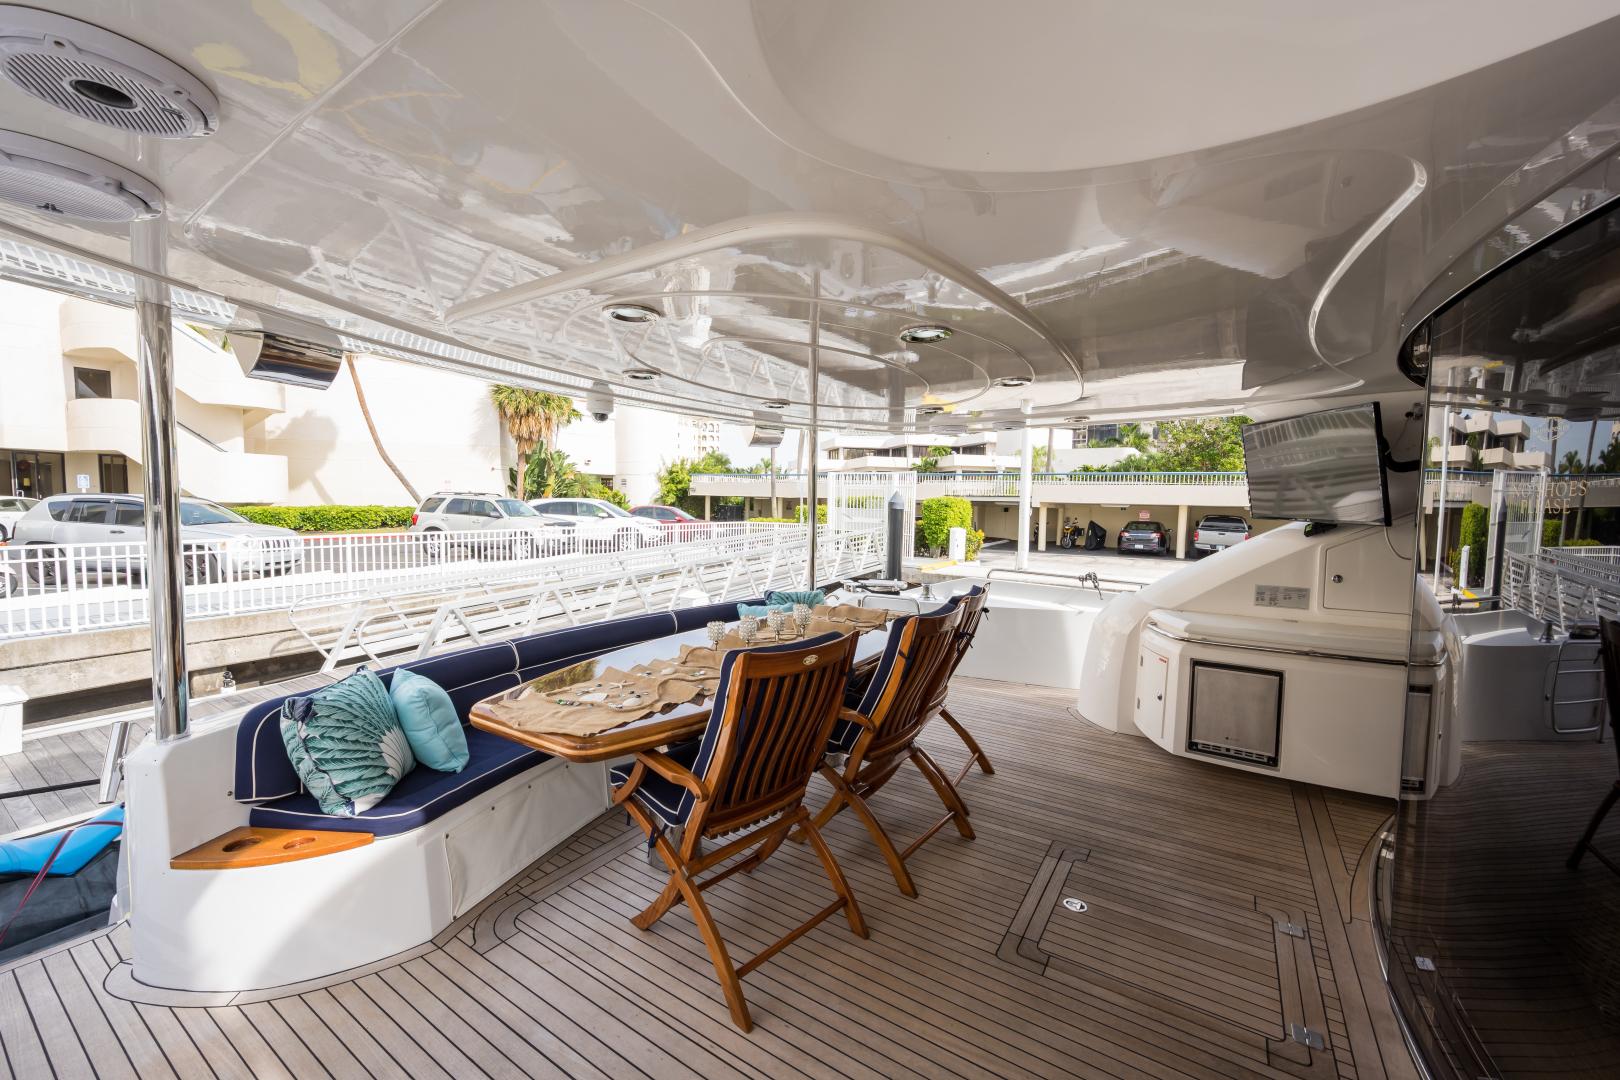 Sunseeker-Yacht 2004-TOP GUN Aventura-Florida-United States-1450687 | Thumbnail